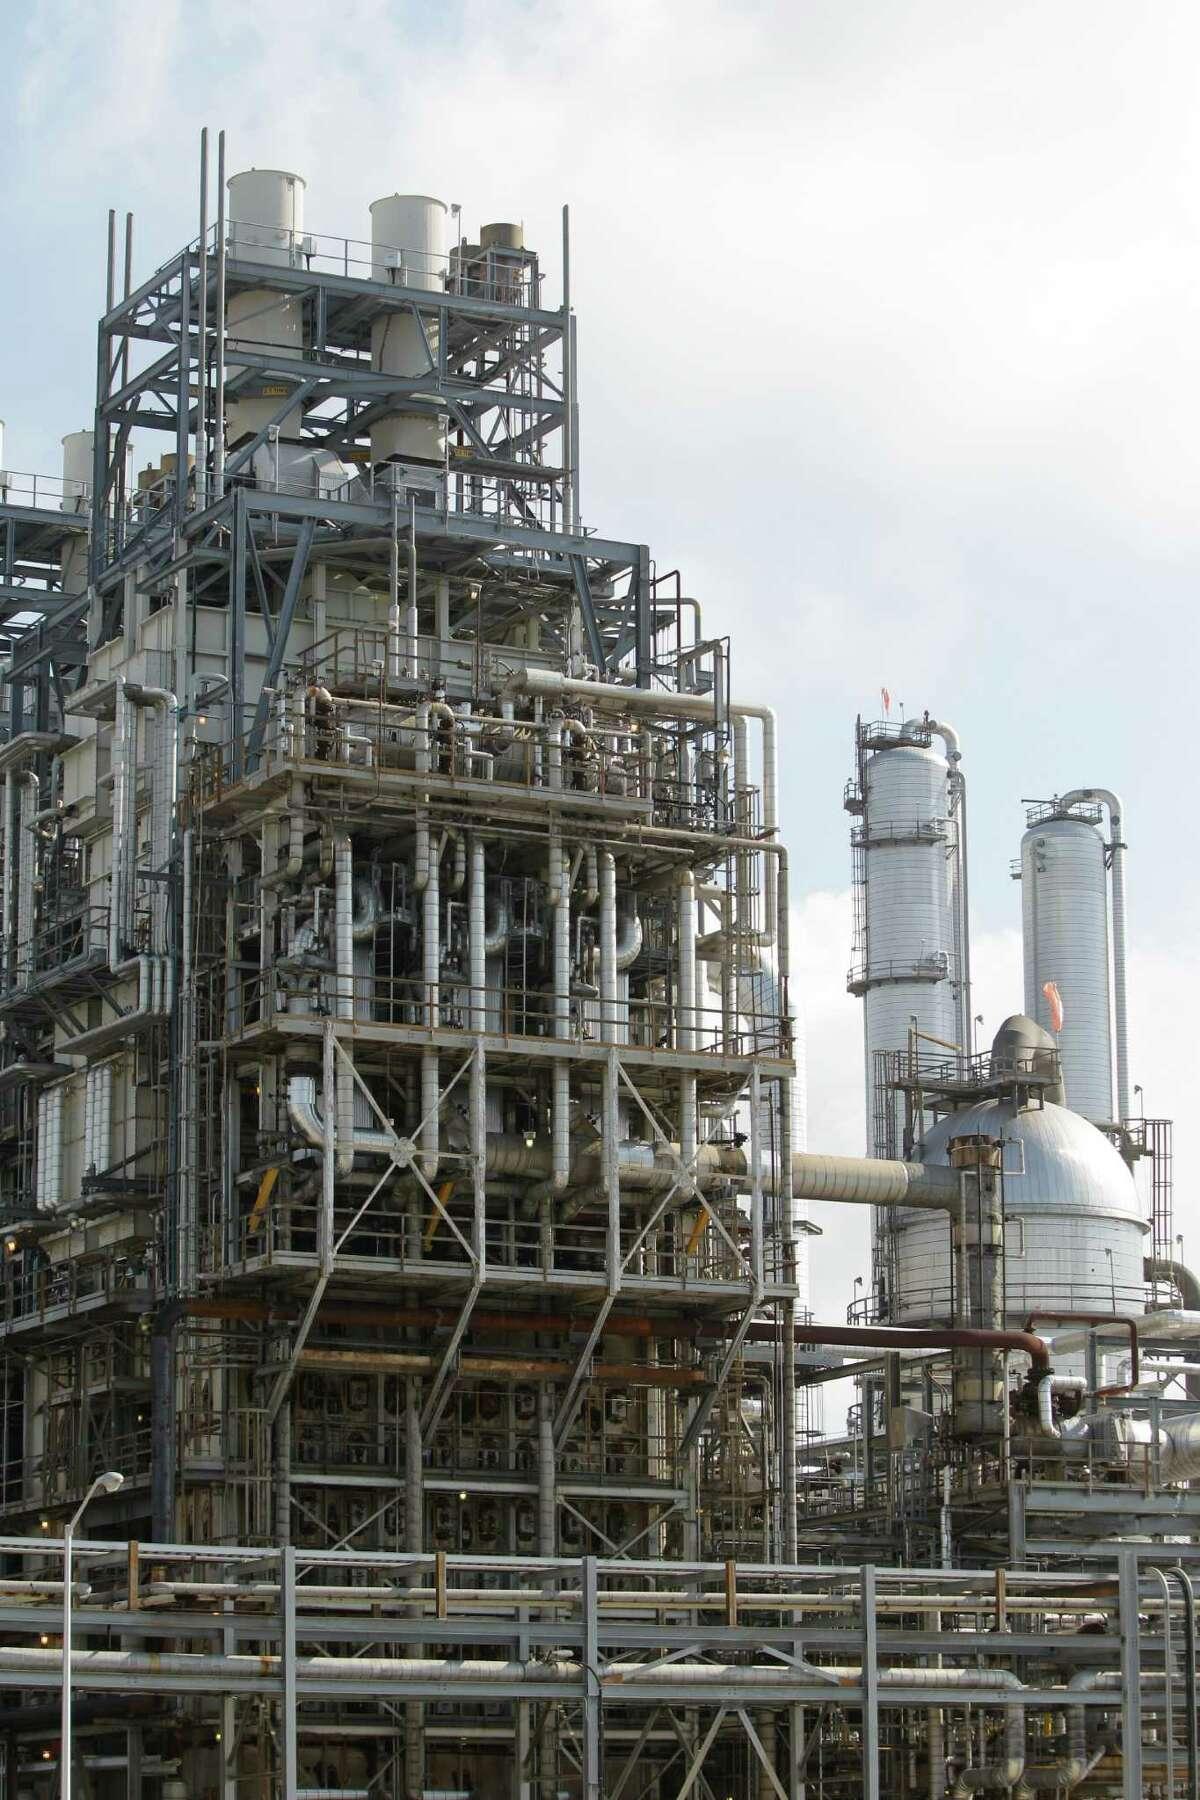 An ethylene unit shown at the Chevron Phillips Chemical Company's Cedar Bayou Plant, 9500 I-10 East, Tuesday, June 5, 2012, in Baytown. ( Melissa Phillip / Houston Chronicle )